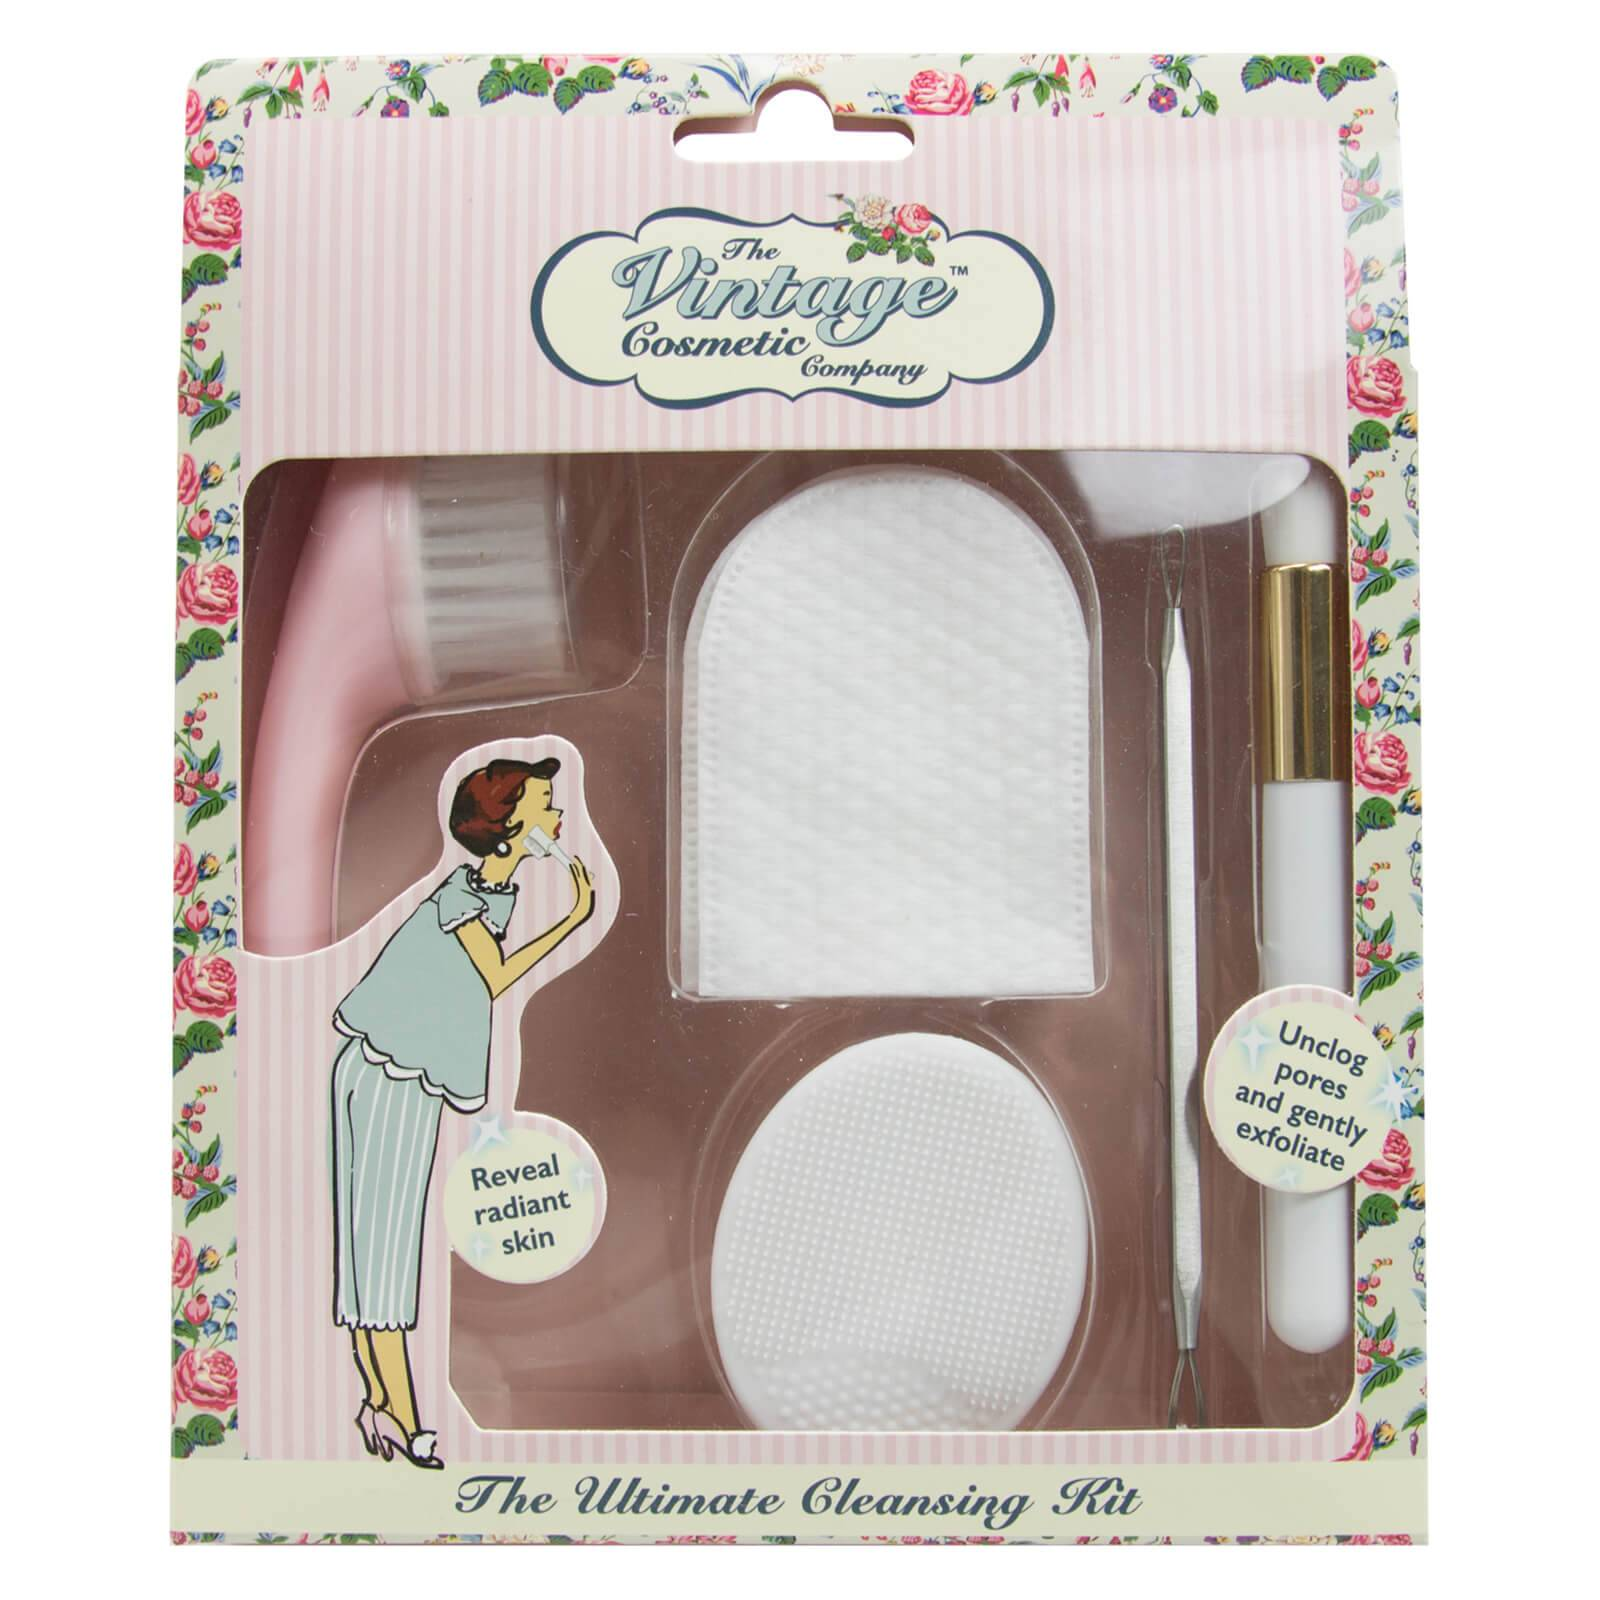 The Vintage Cosmetic Company Kit de Nettoyage Ultime The Vintage Cosmetic Company